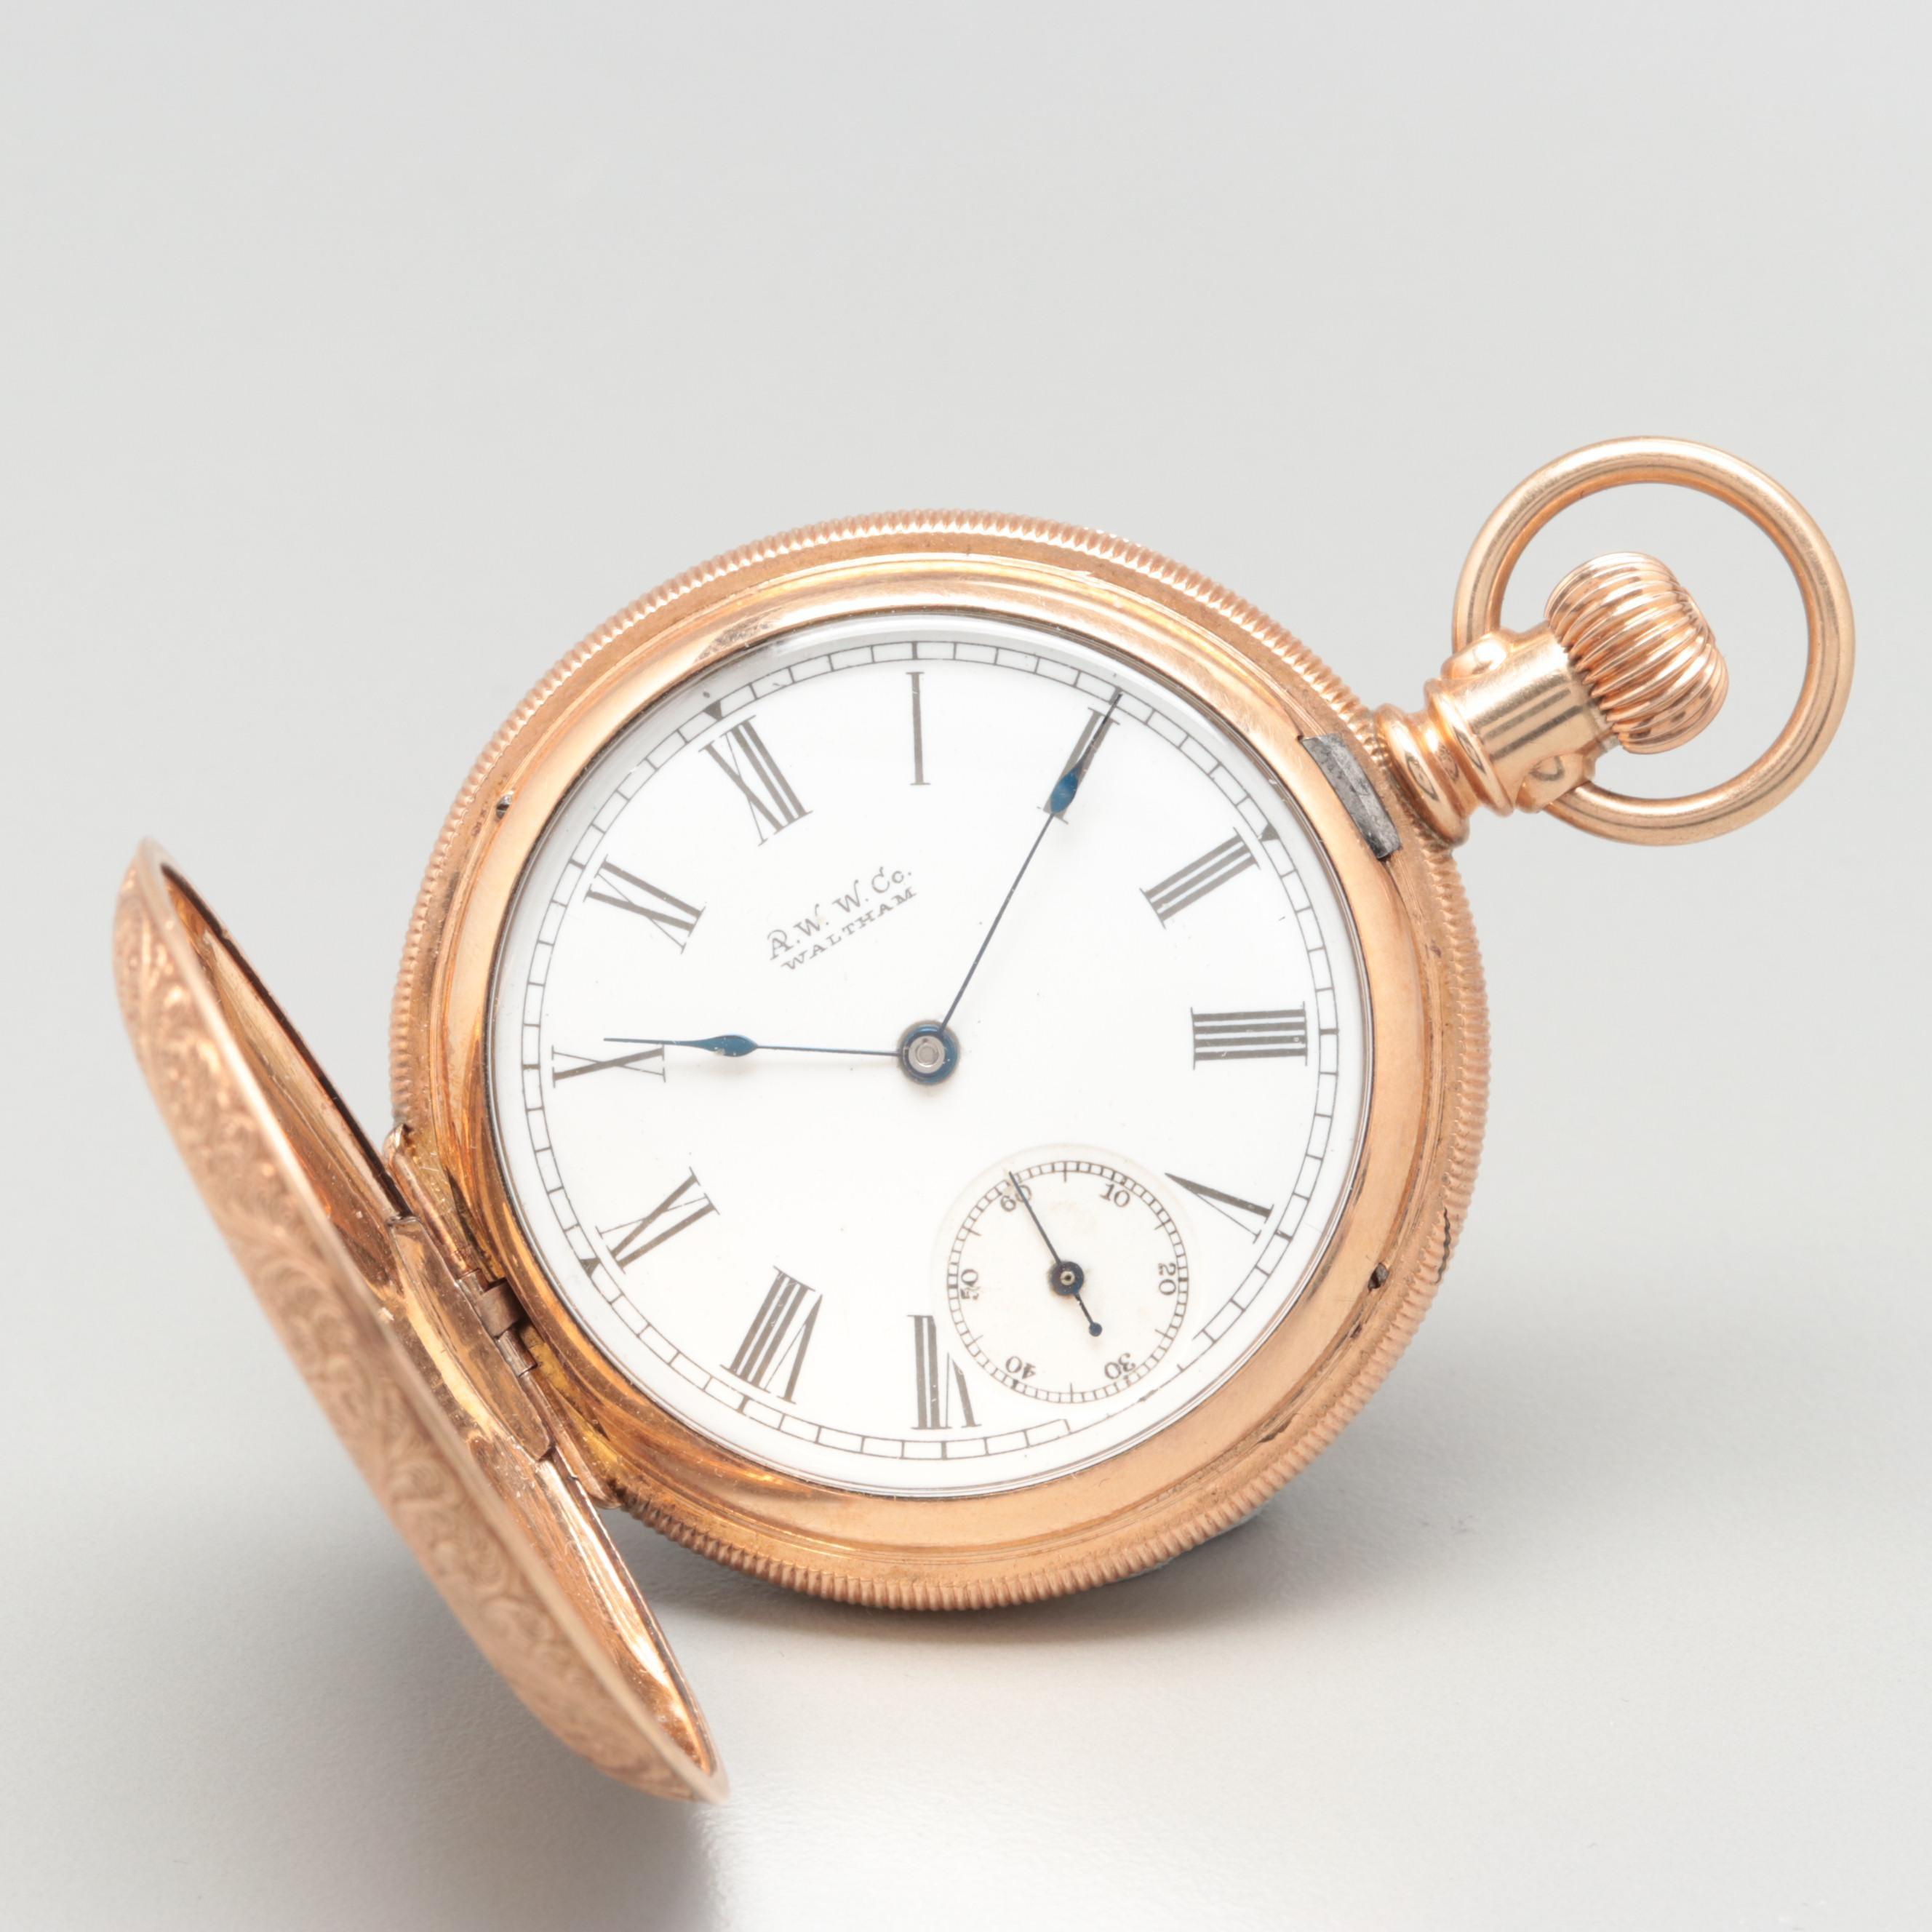 Waltham Gold Filled Hunting Case Pocket Watch, Circa 1891